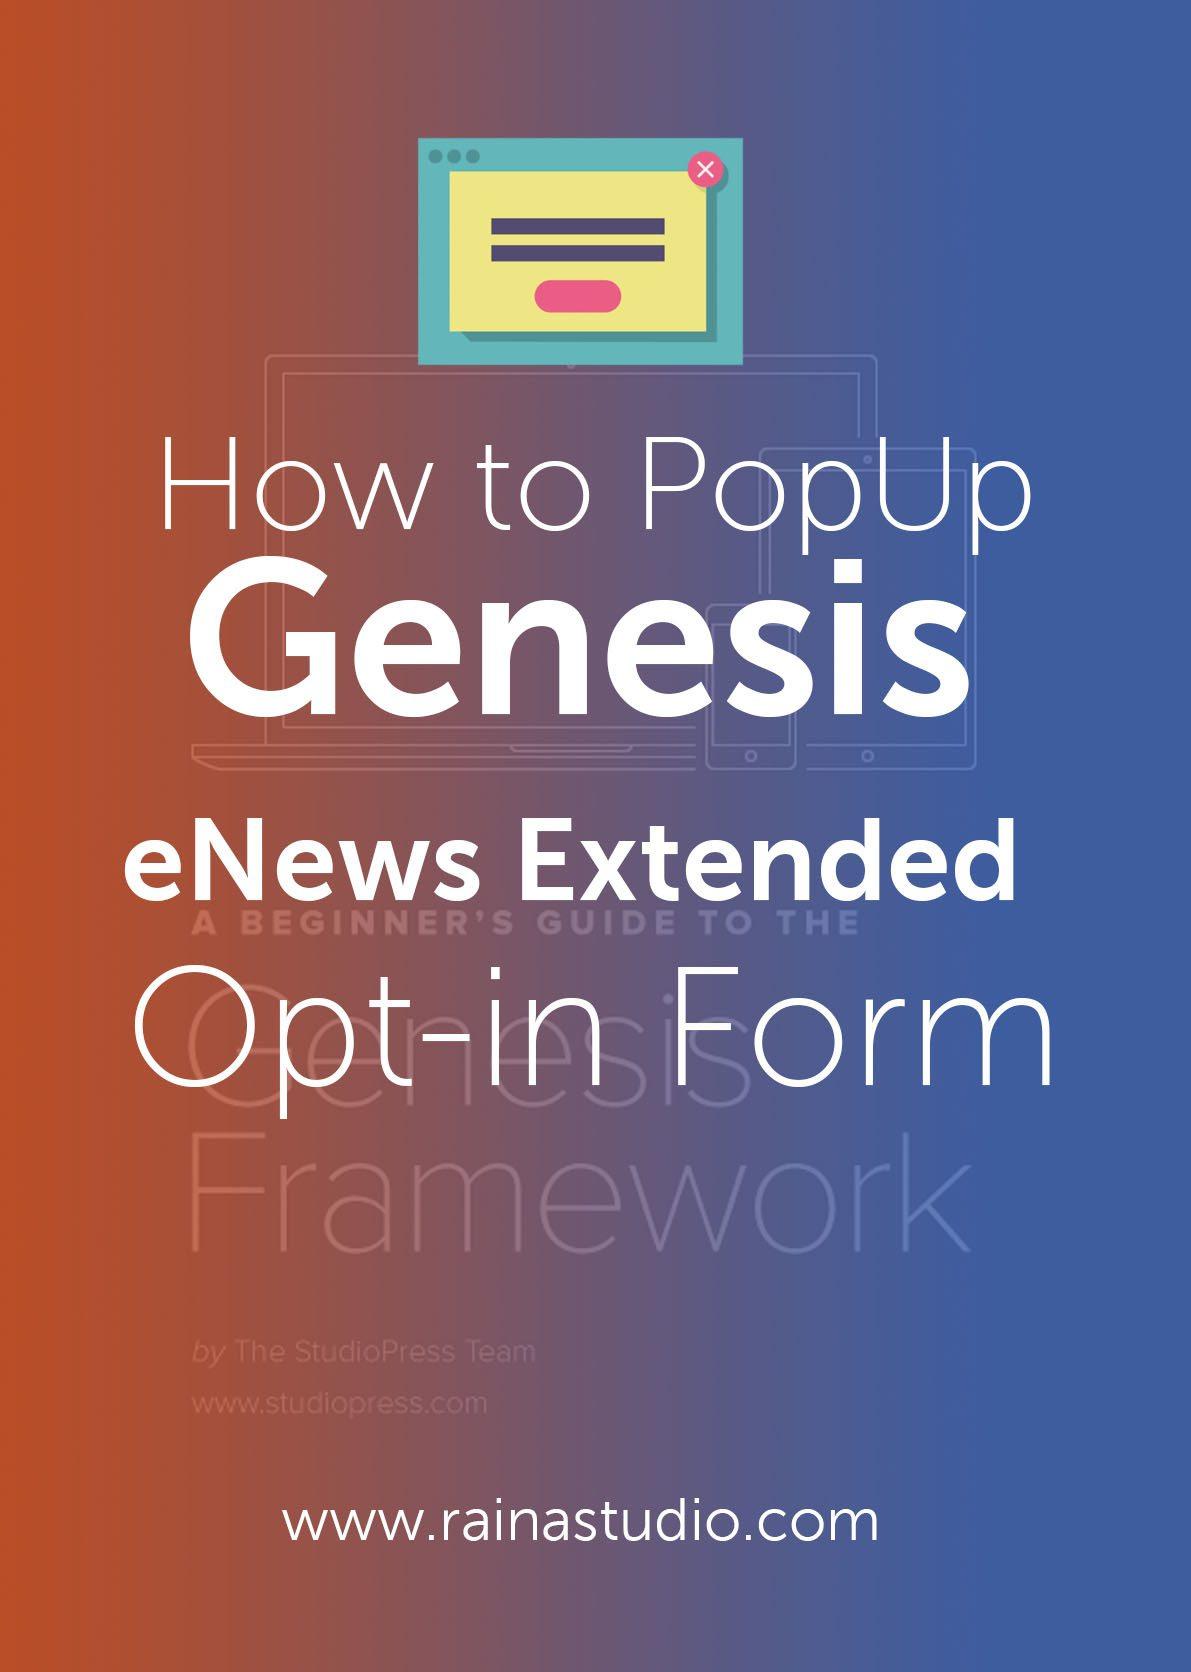 Popup-Genesis-eNews-Extended-Opt-in-Form